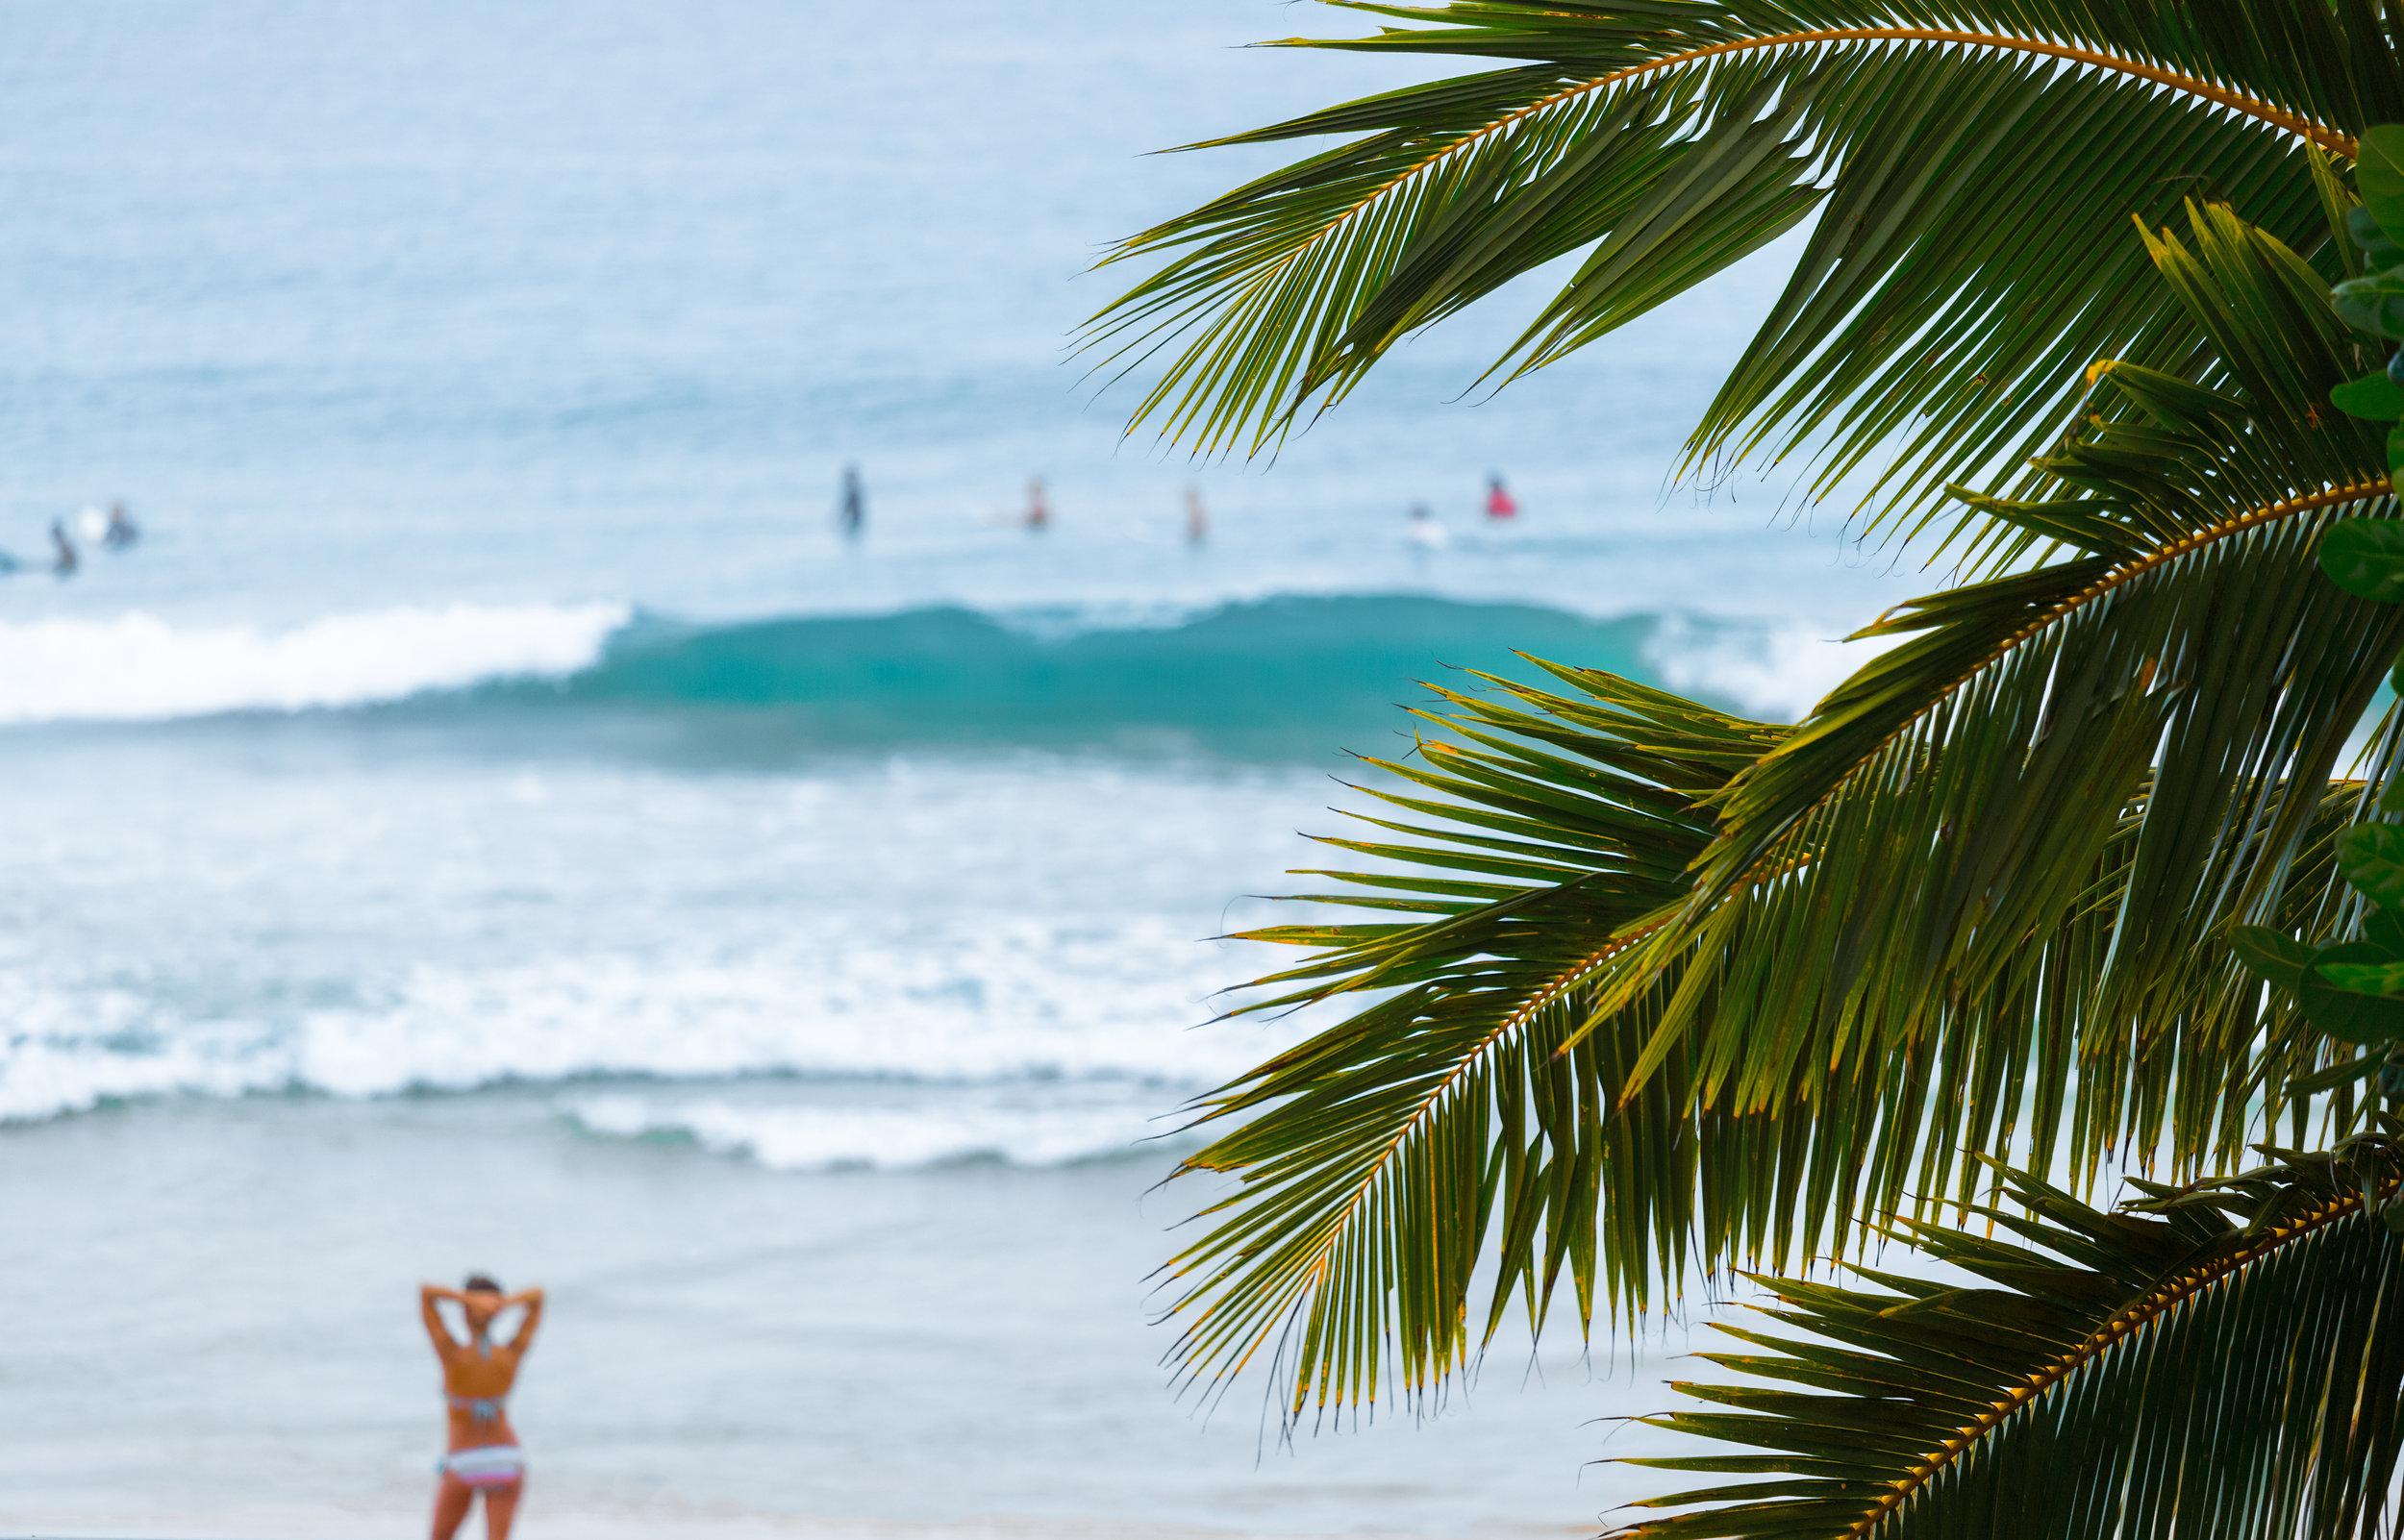 srilanka_hikkaduwa_bigstock-Tropical-beach-with-palm-trees-115241447.jpg